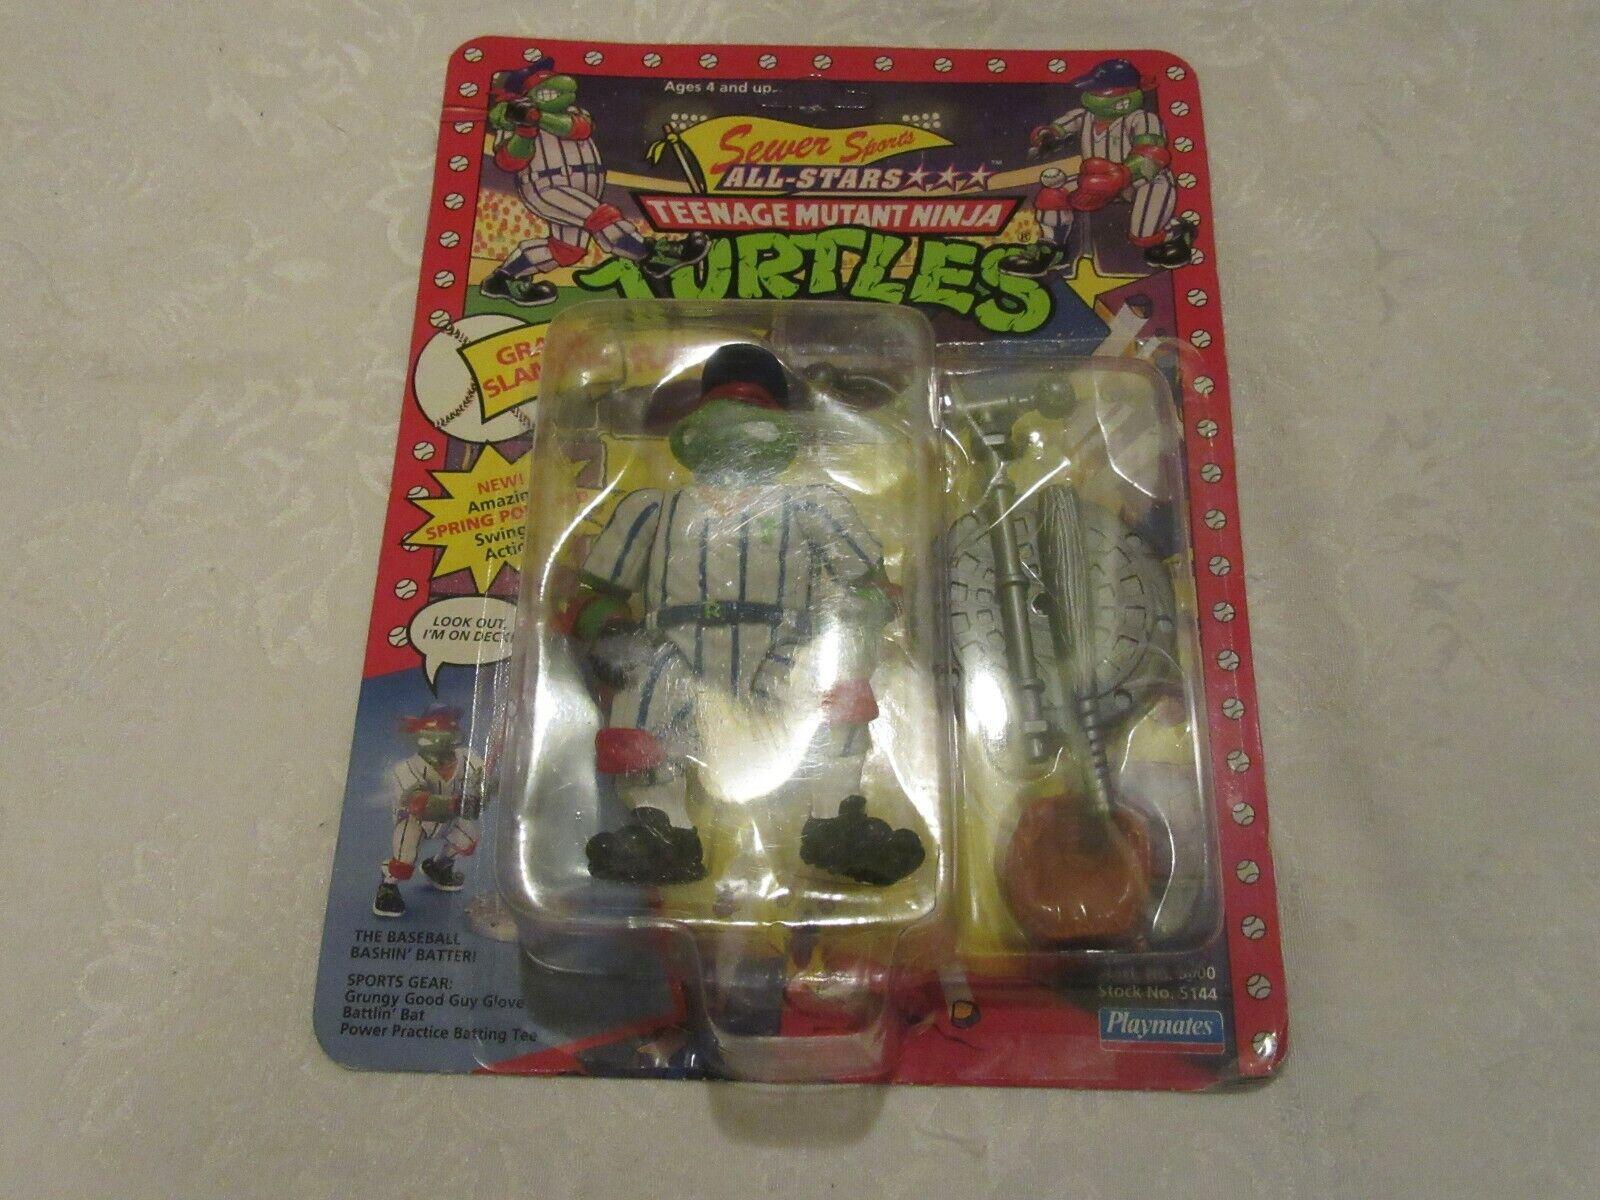 Tmnt Teenage Mutant Ninja Turtles alcantarillado Deportes All-Estrellas Grand Slammin Raph